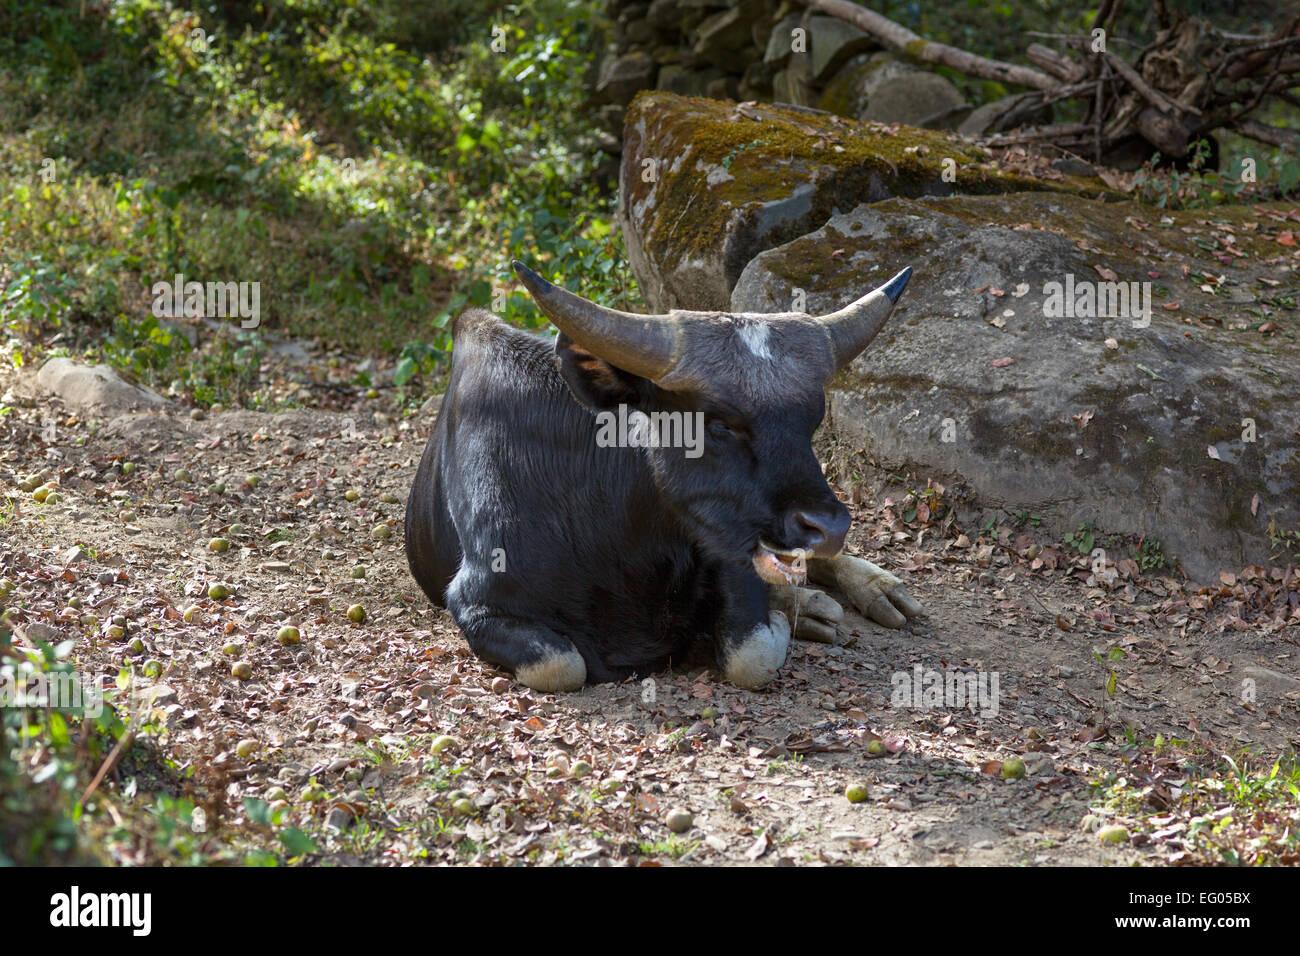 A Mithun, the state animal of Nagaland and Arunachal Pradesh - Stock Image